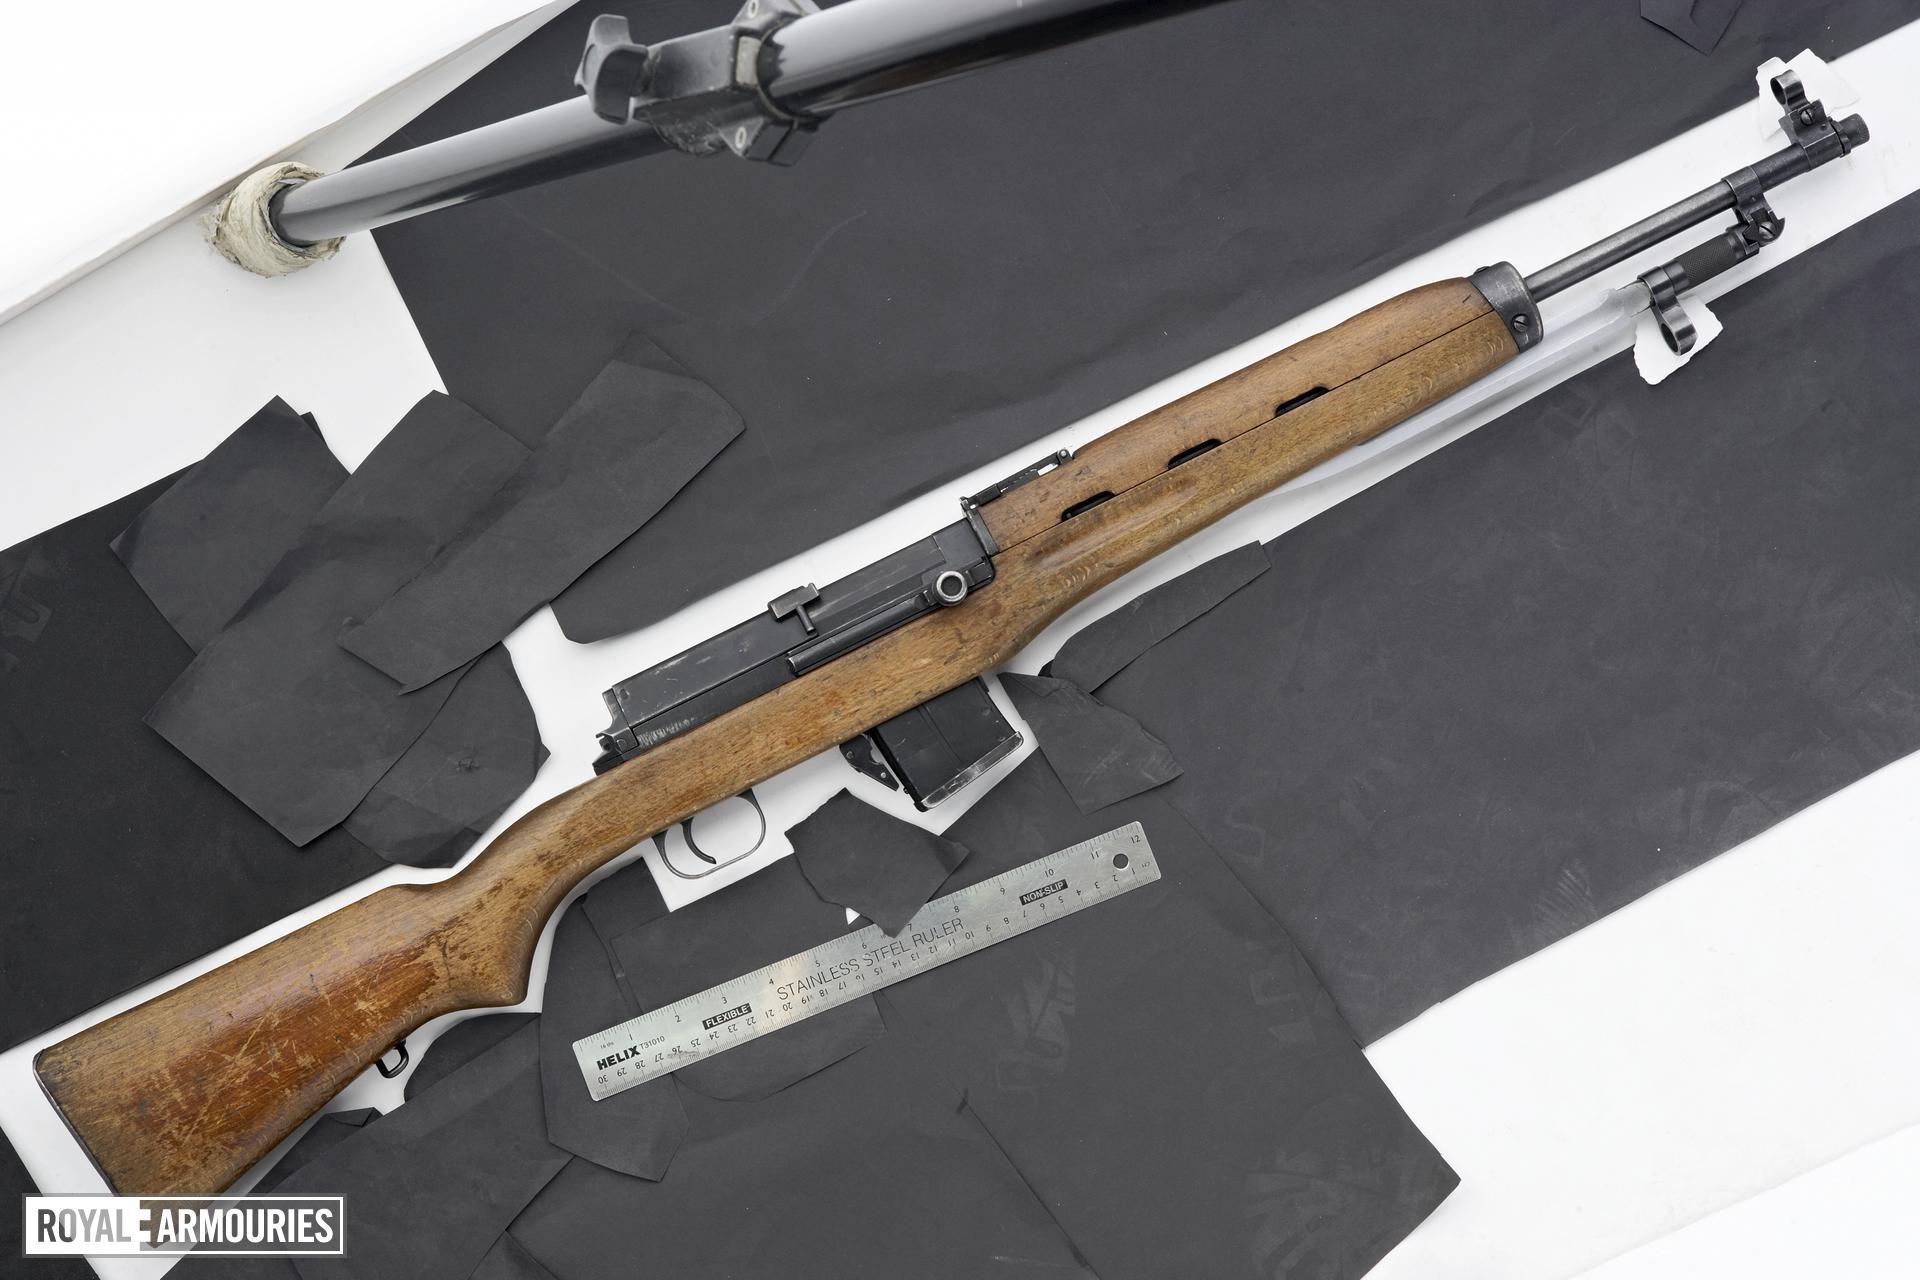 Centrefire self-loading rifle - Rasheed